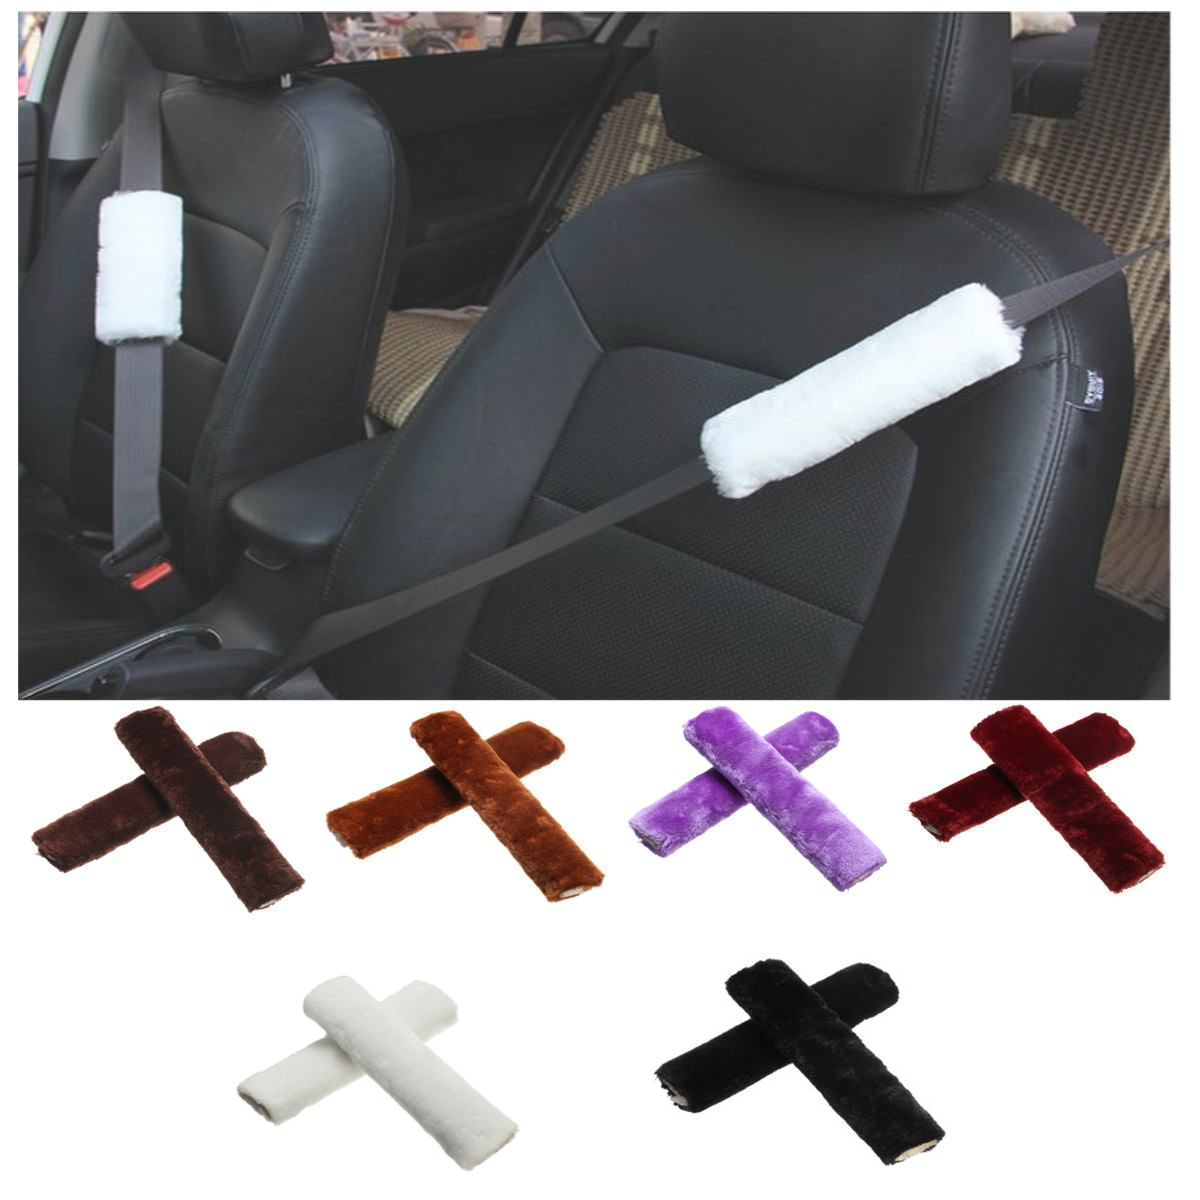 Pair Car Seat Belt Cover Shoulder Pad Shoulder Strap Case Comfortable Auto Driving Seatbelt Pad Cover